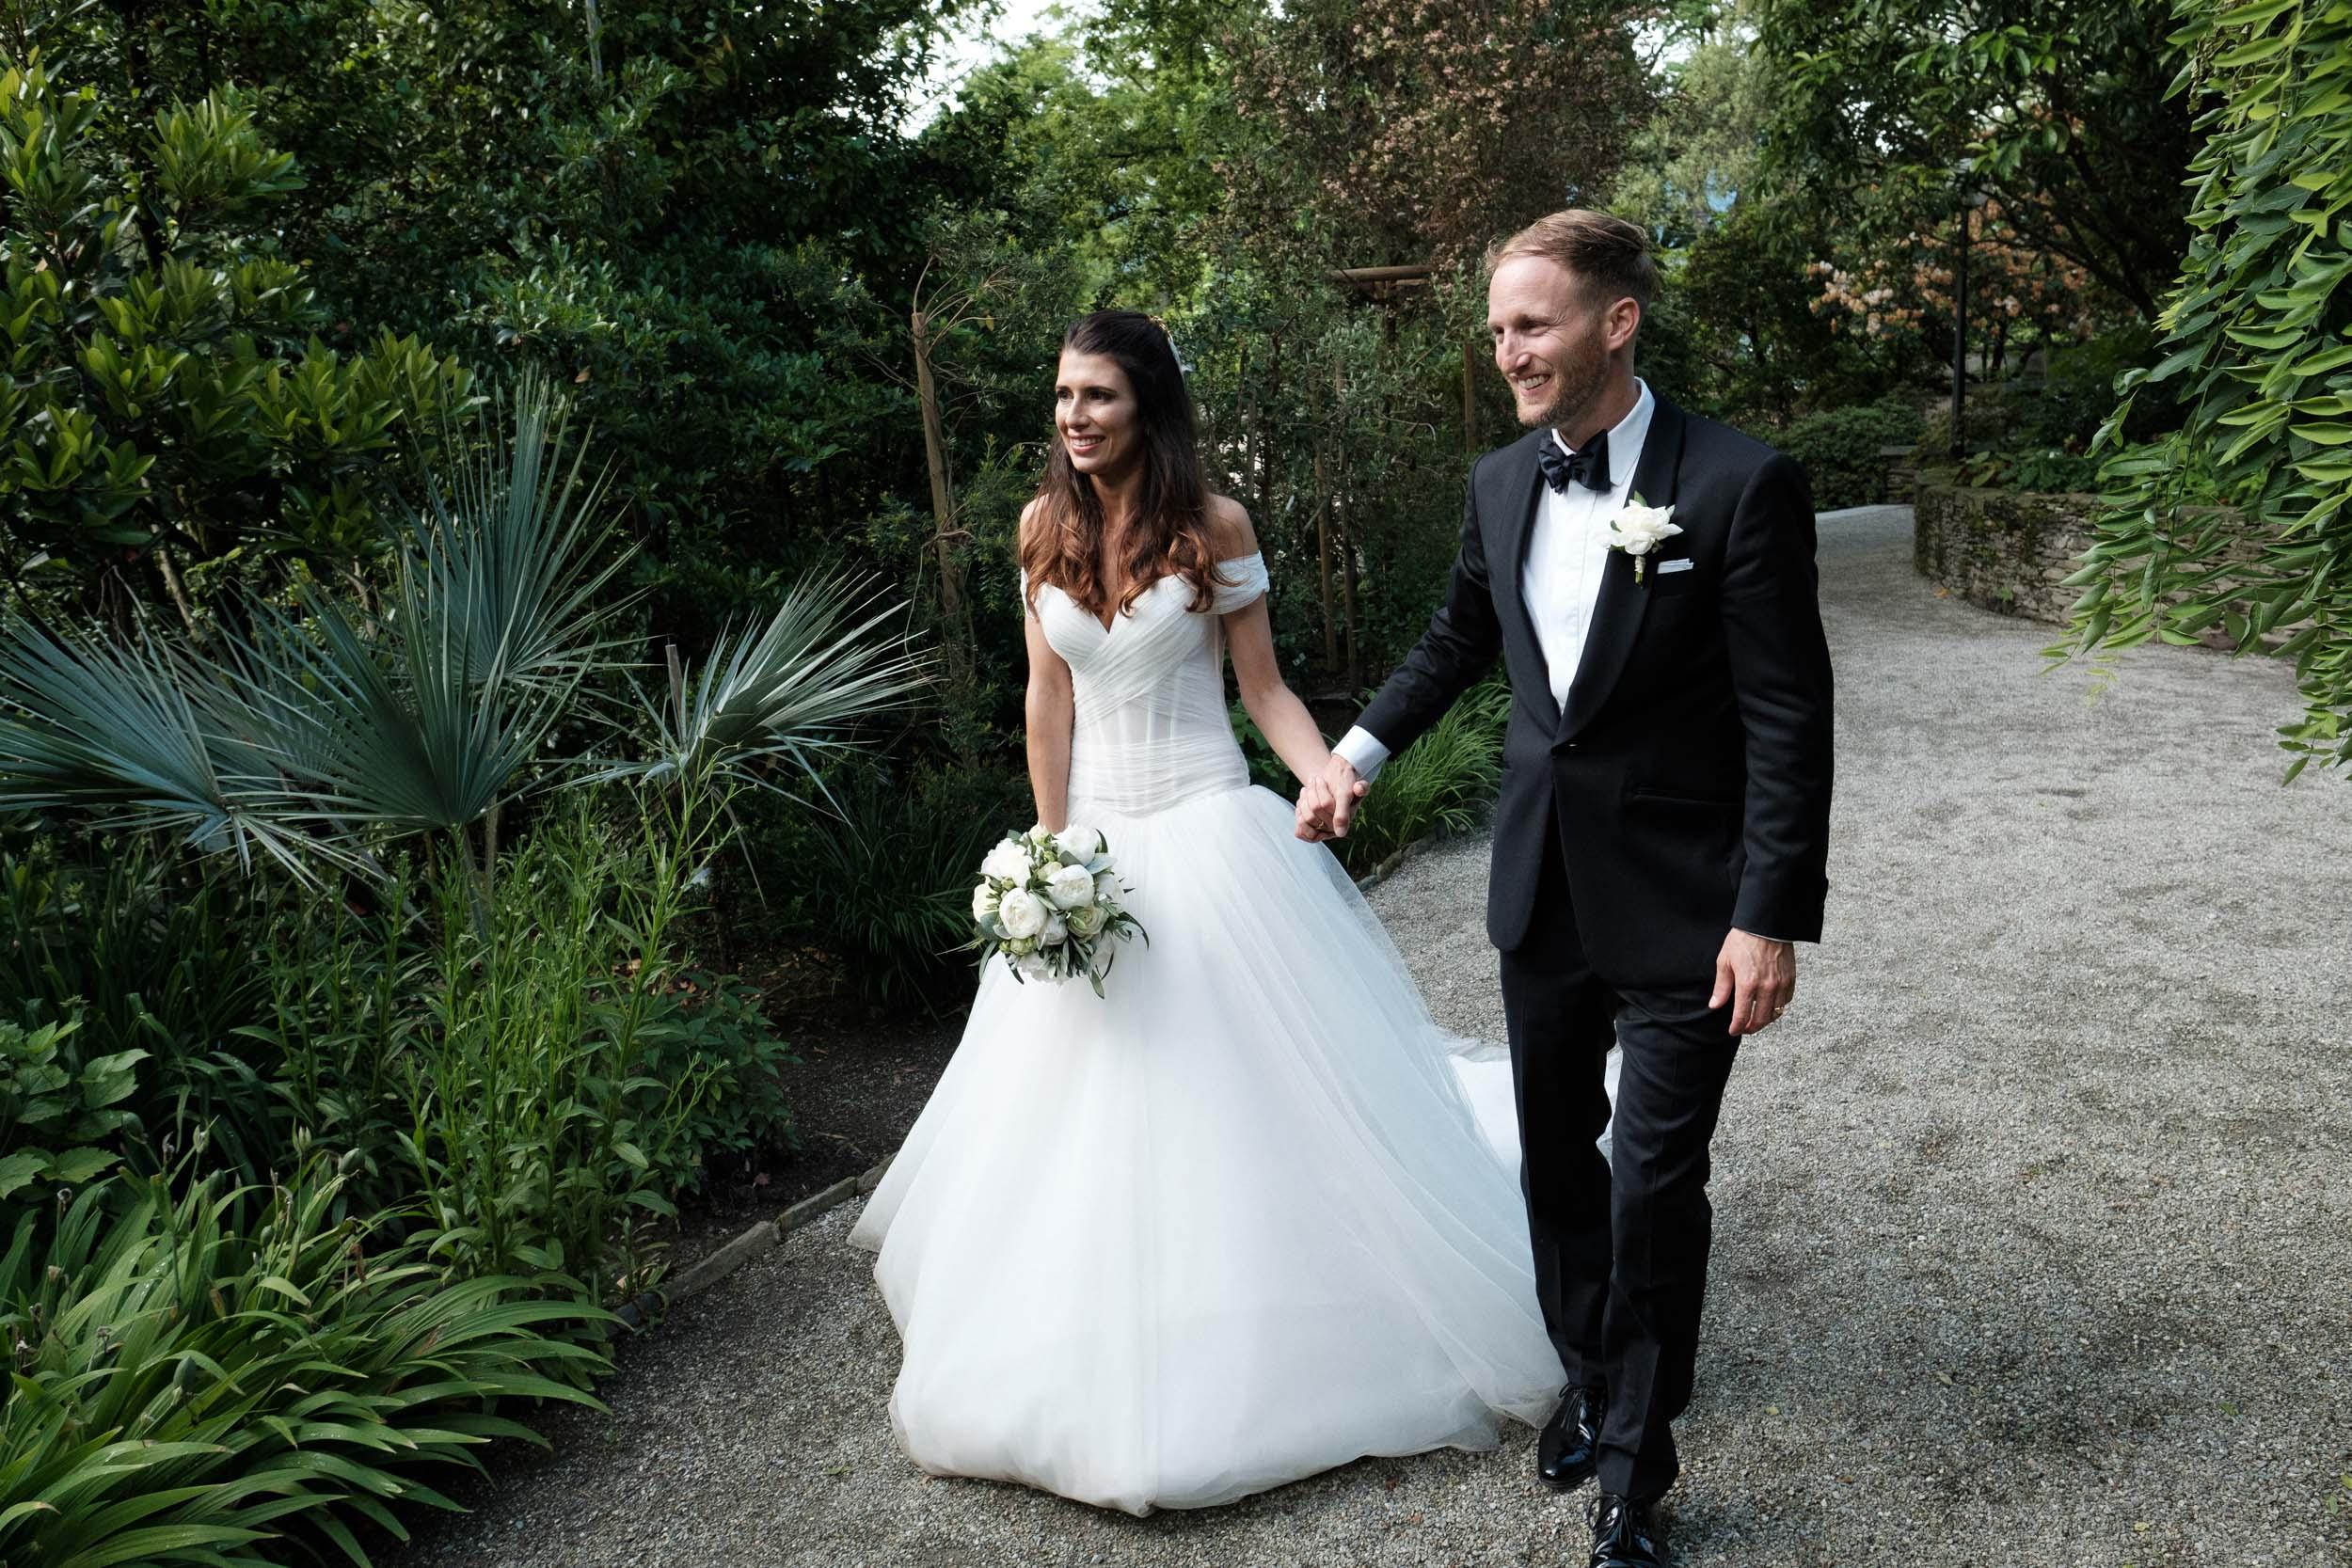 olivia-andreas-wedding-switzerland-385.jpg